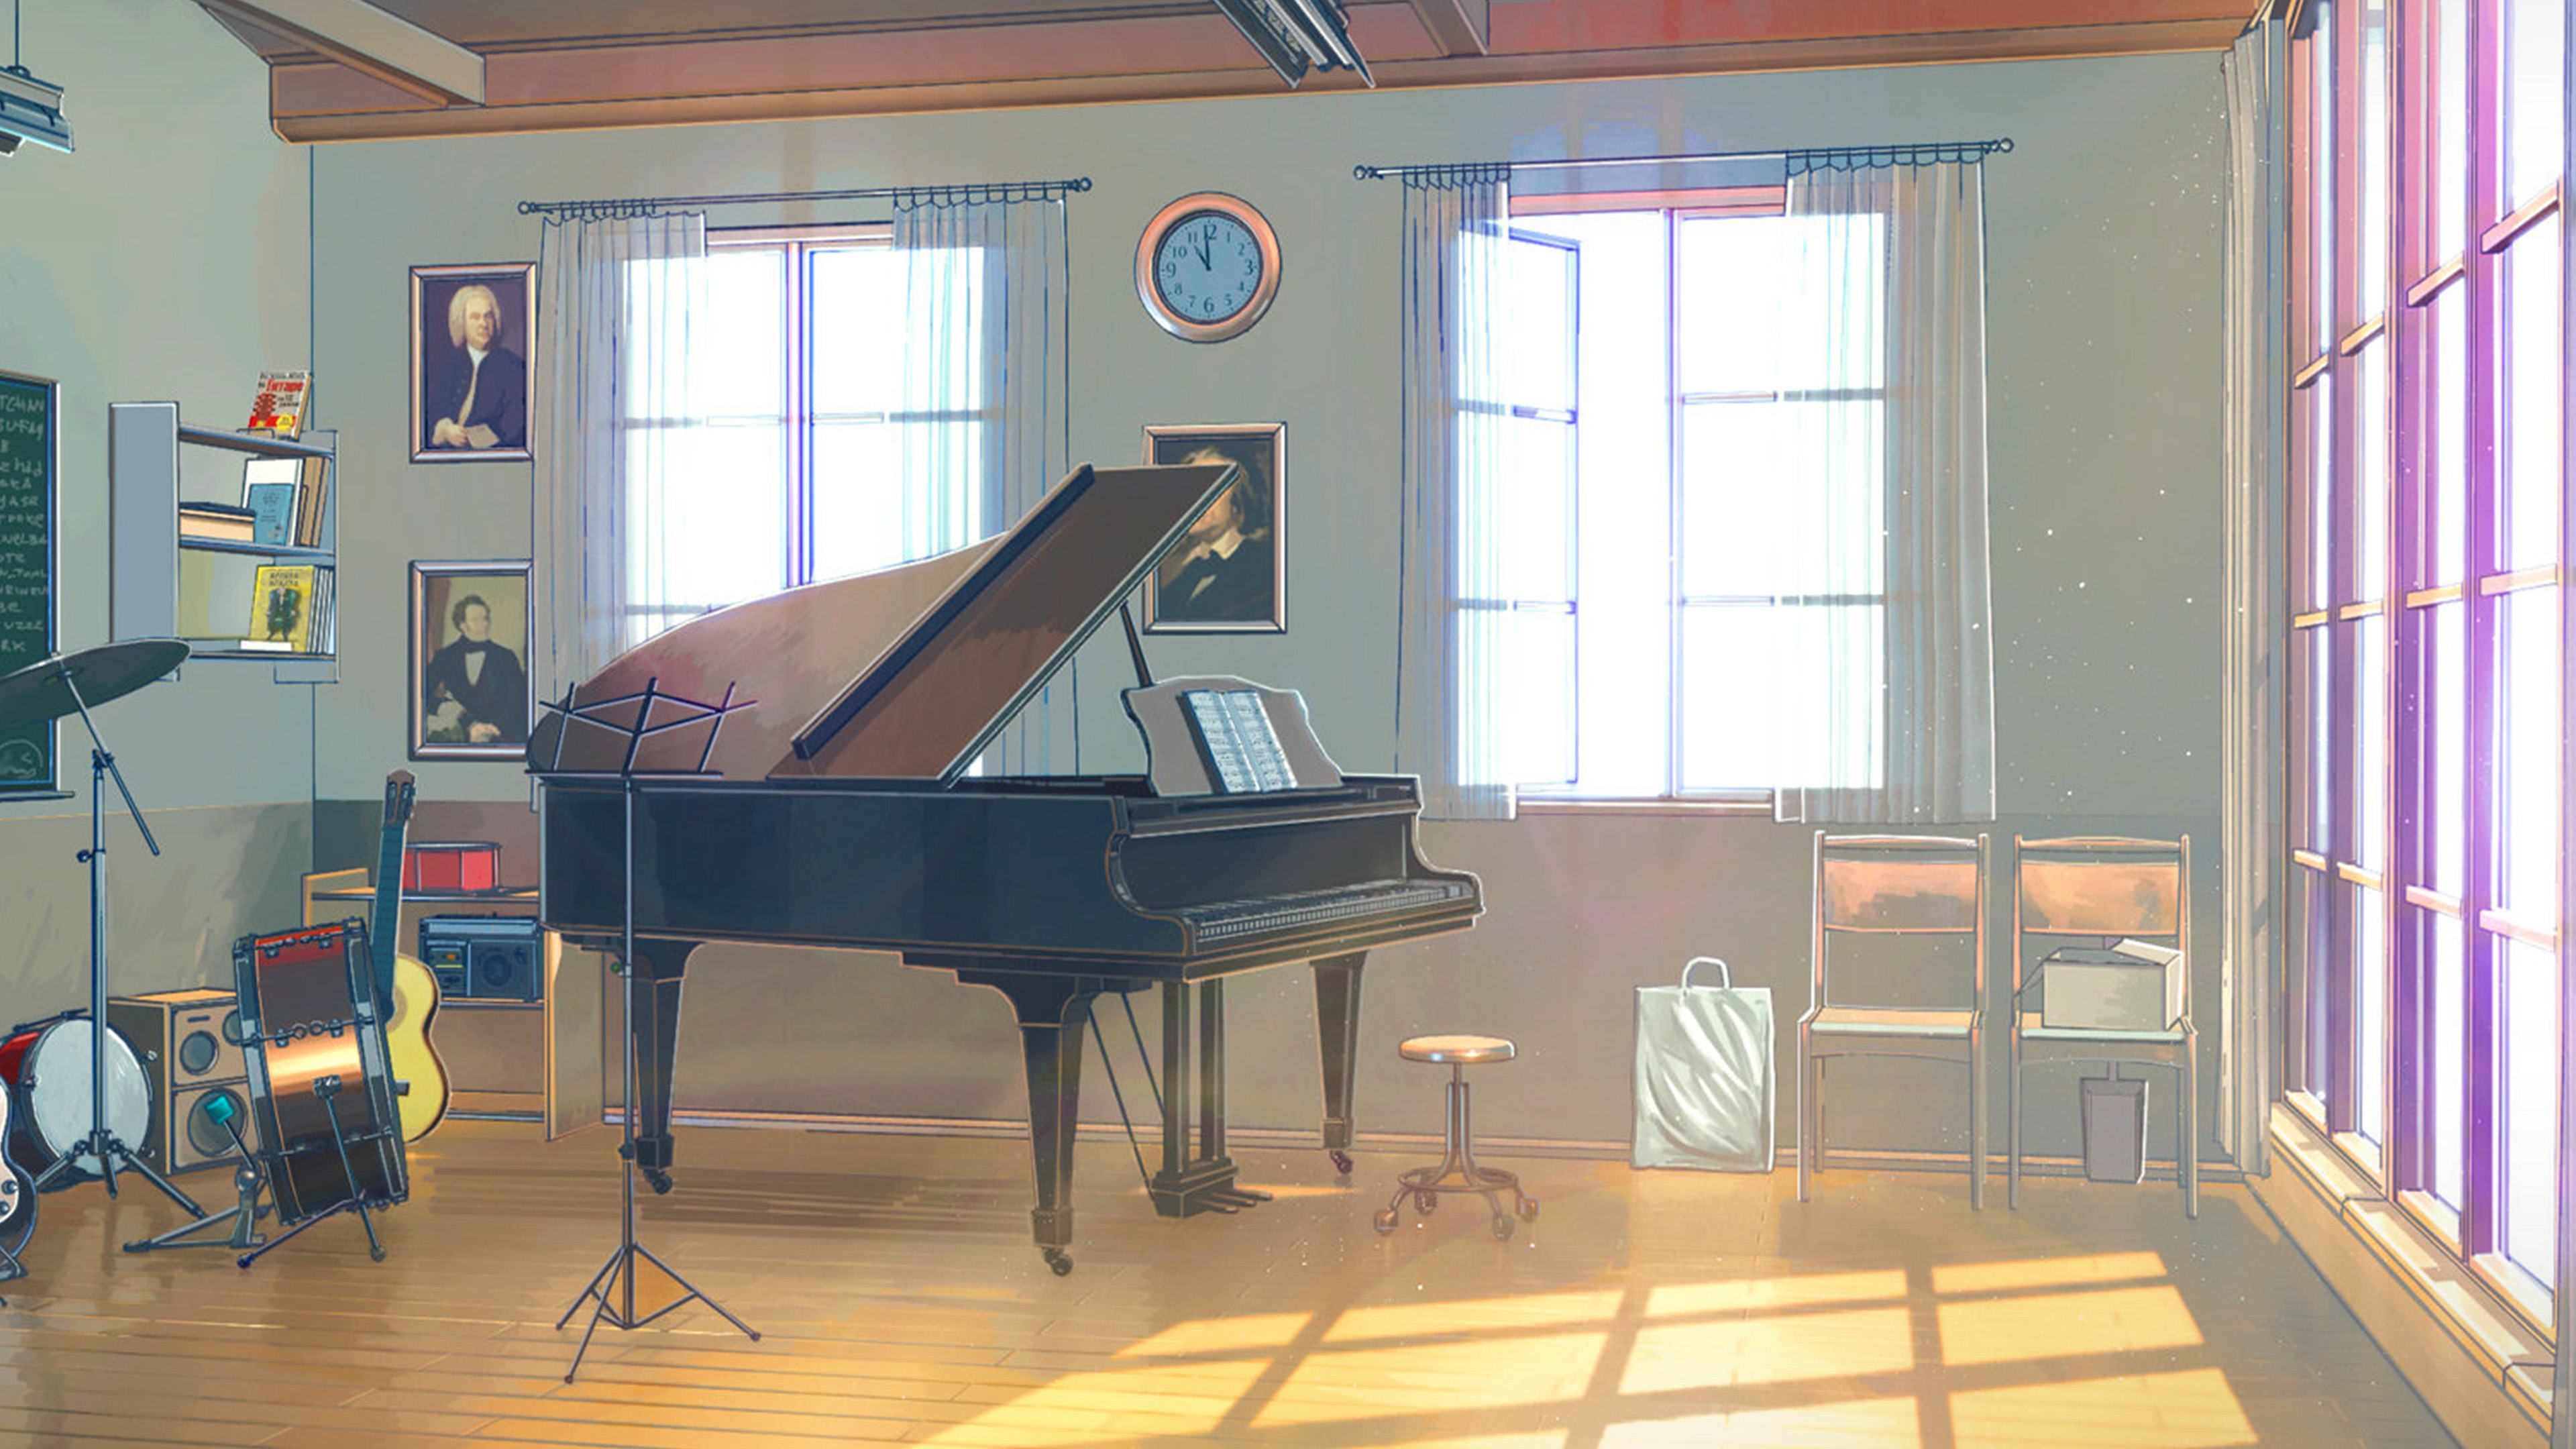 aw48-arseniy-chebynkin-music-room-piano-illustration-art